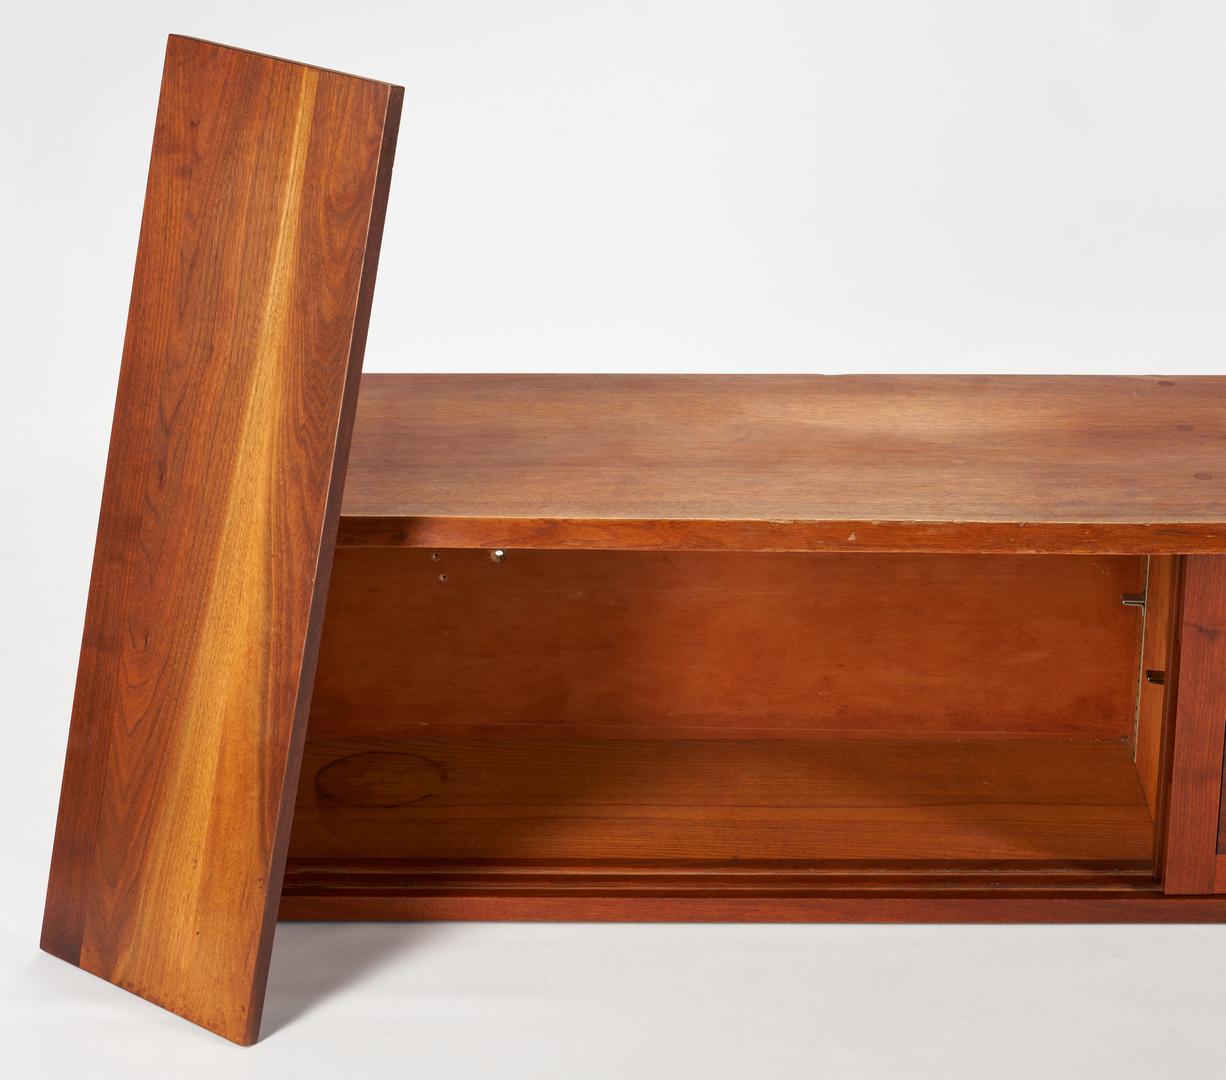 Lot 585: George Nakashima Wall Cabinet